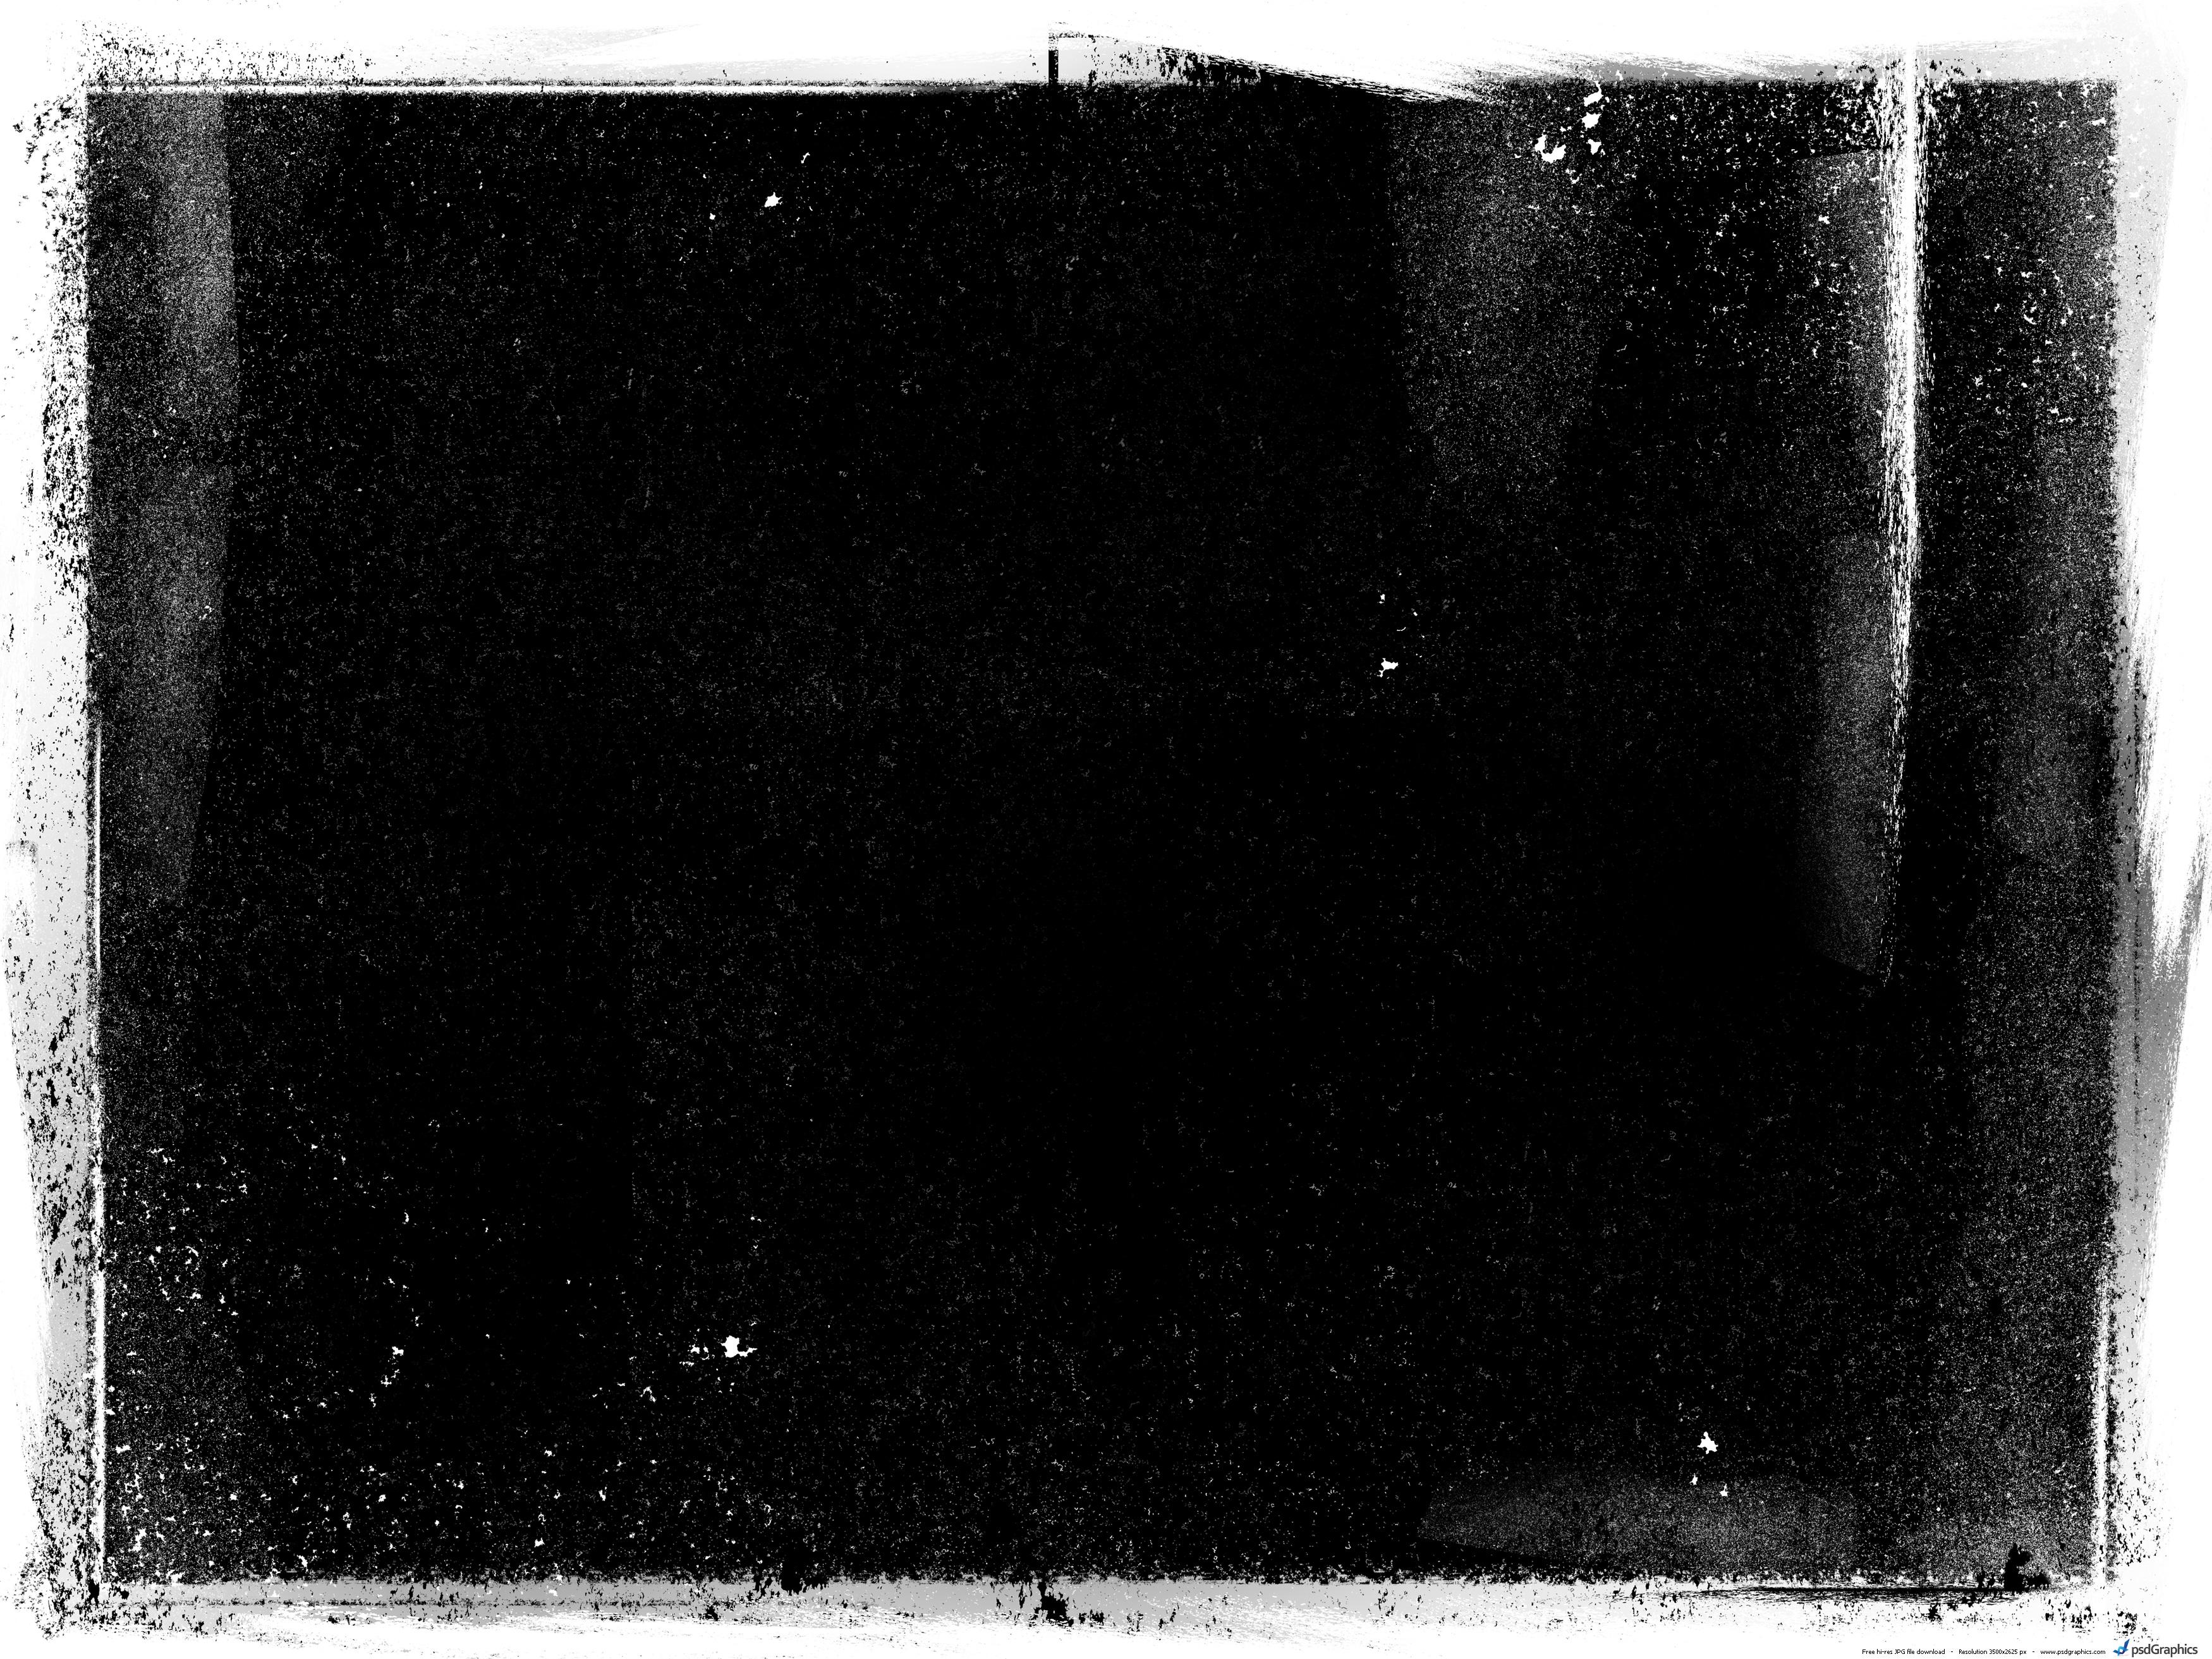 Black grunge background | PSDGraphics